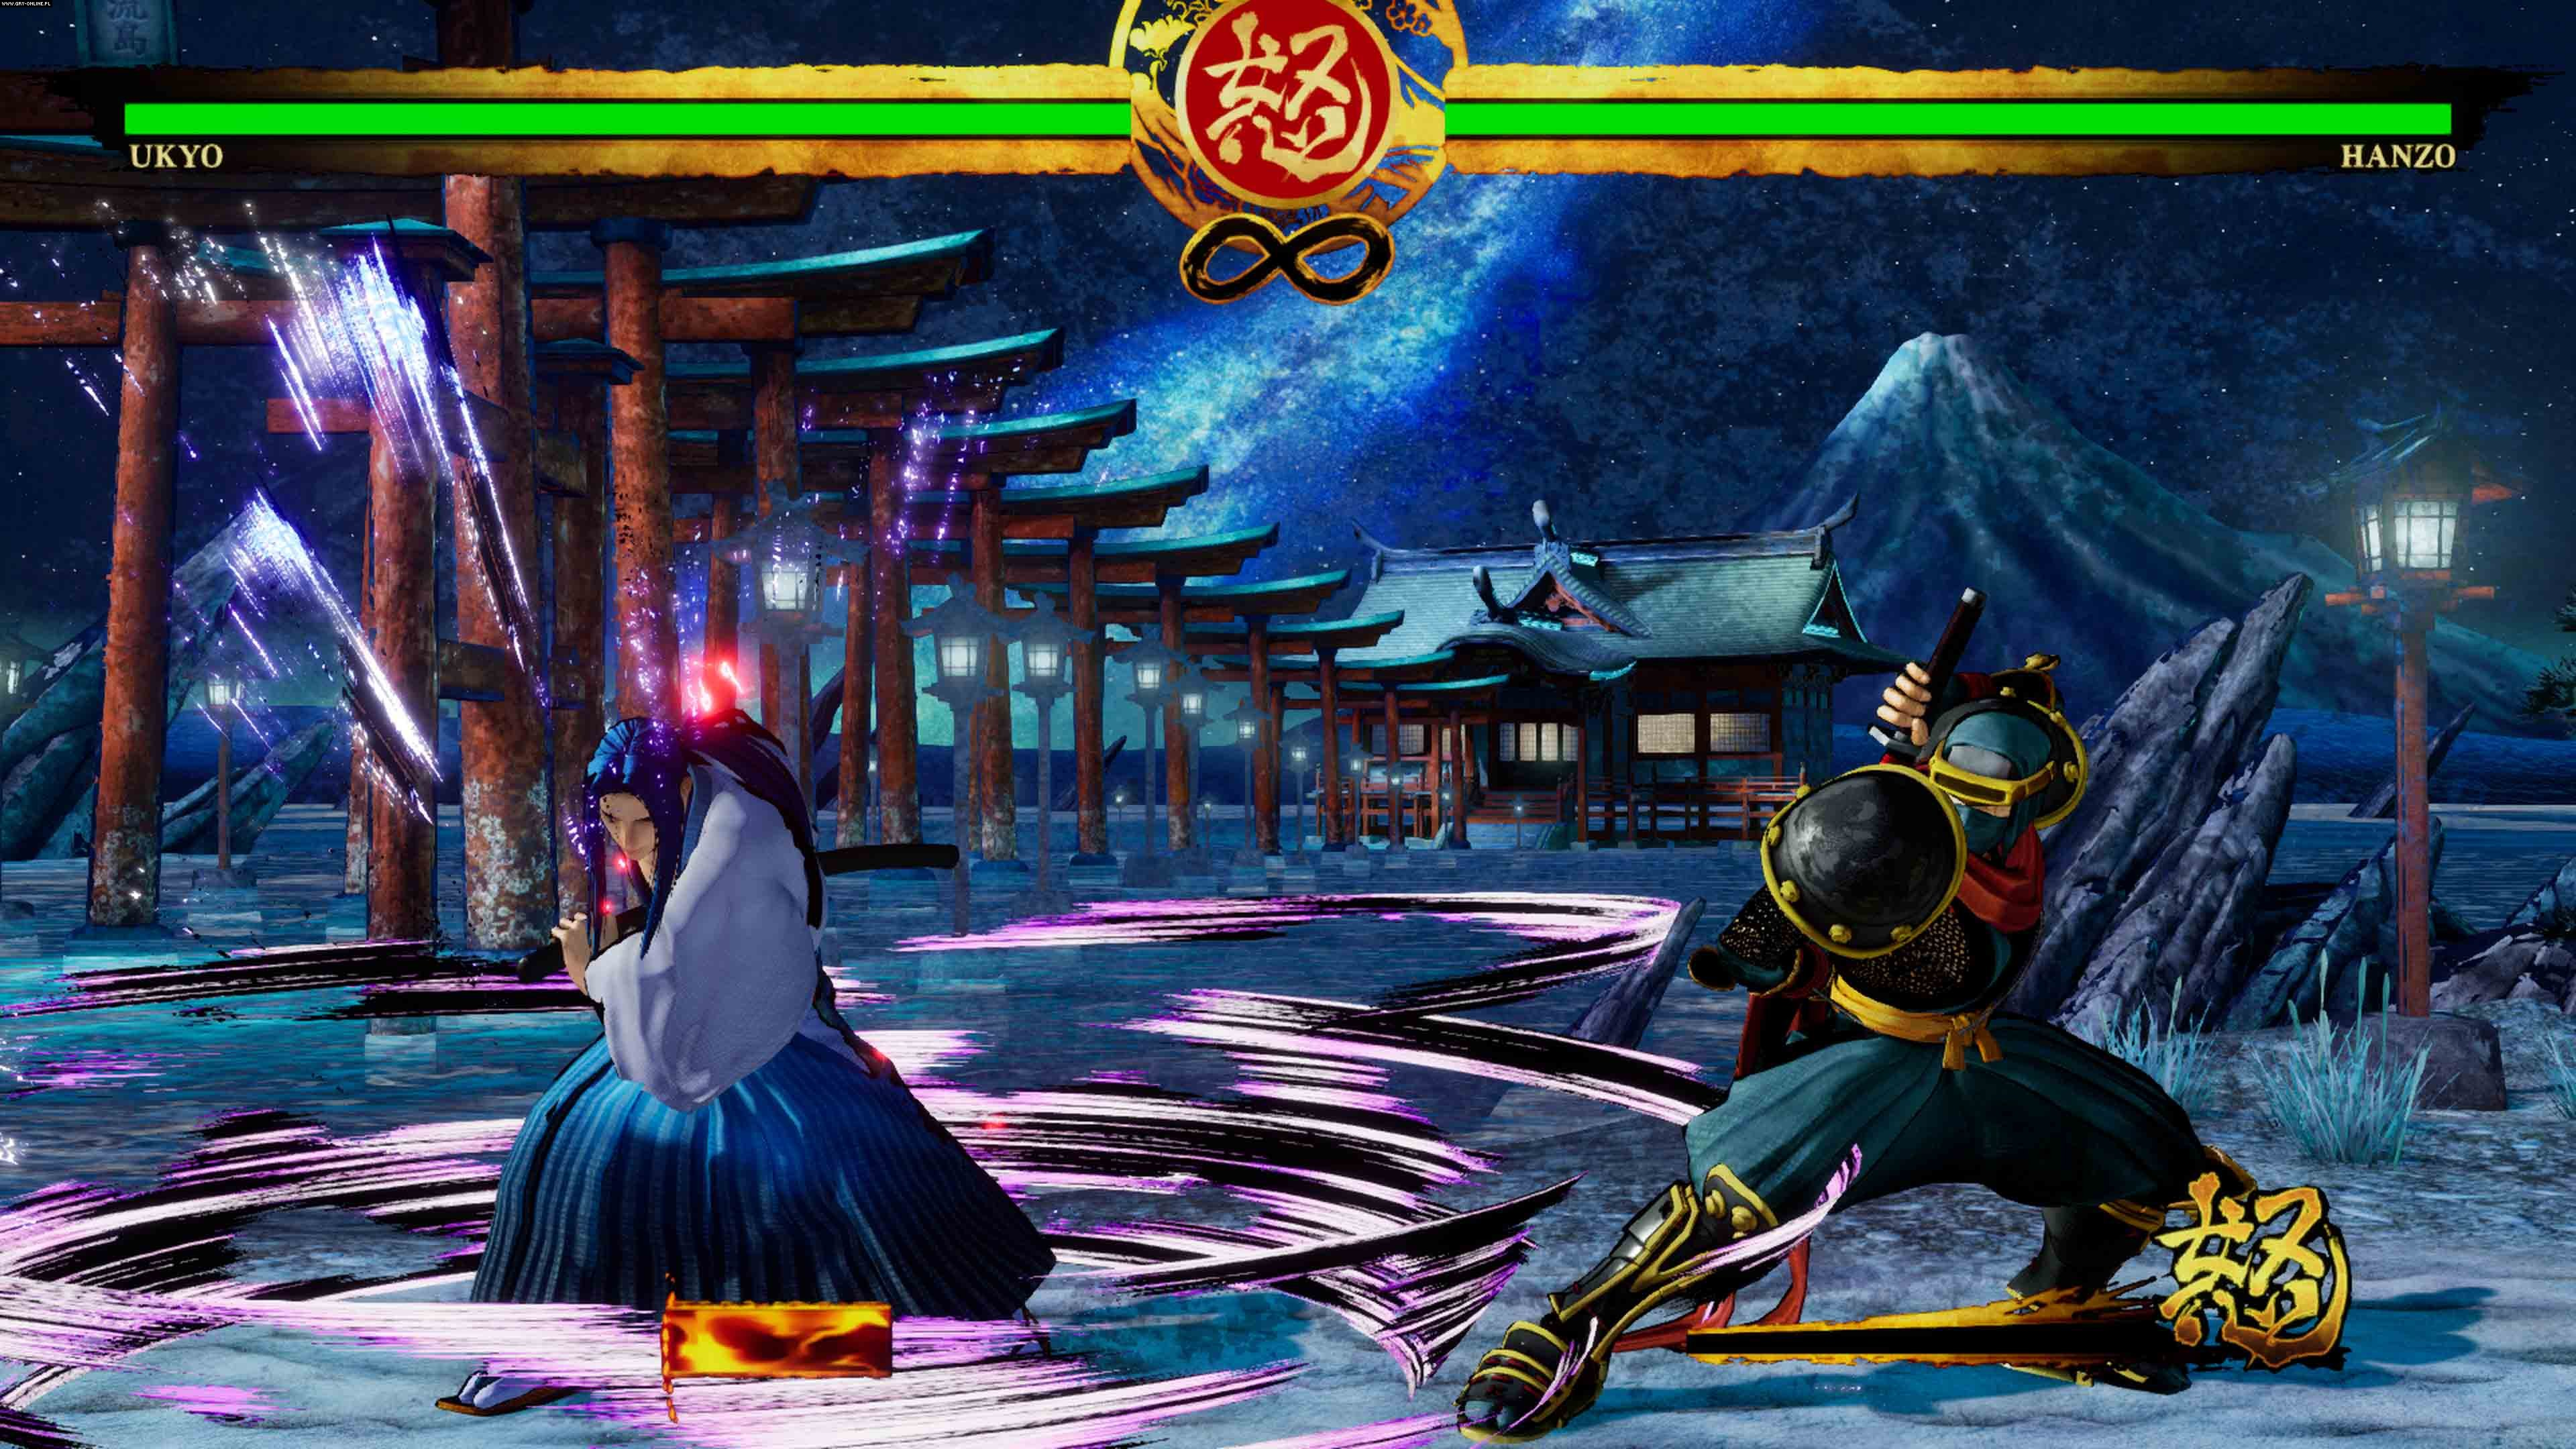 Samurai Shodown PC, PS4, XONE, Switch Games Image 1/30, SNK, Athlon Games